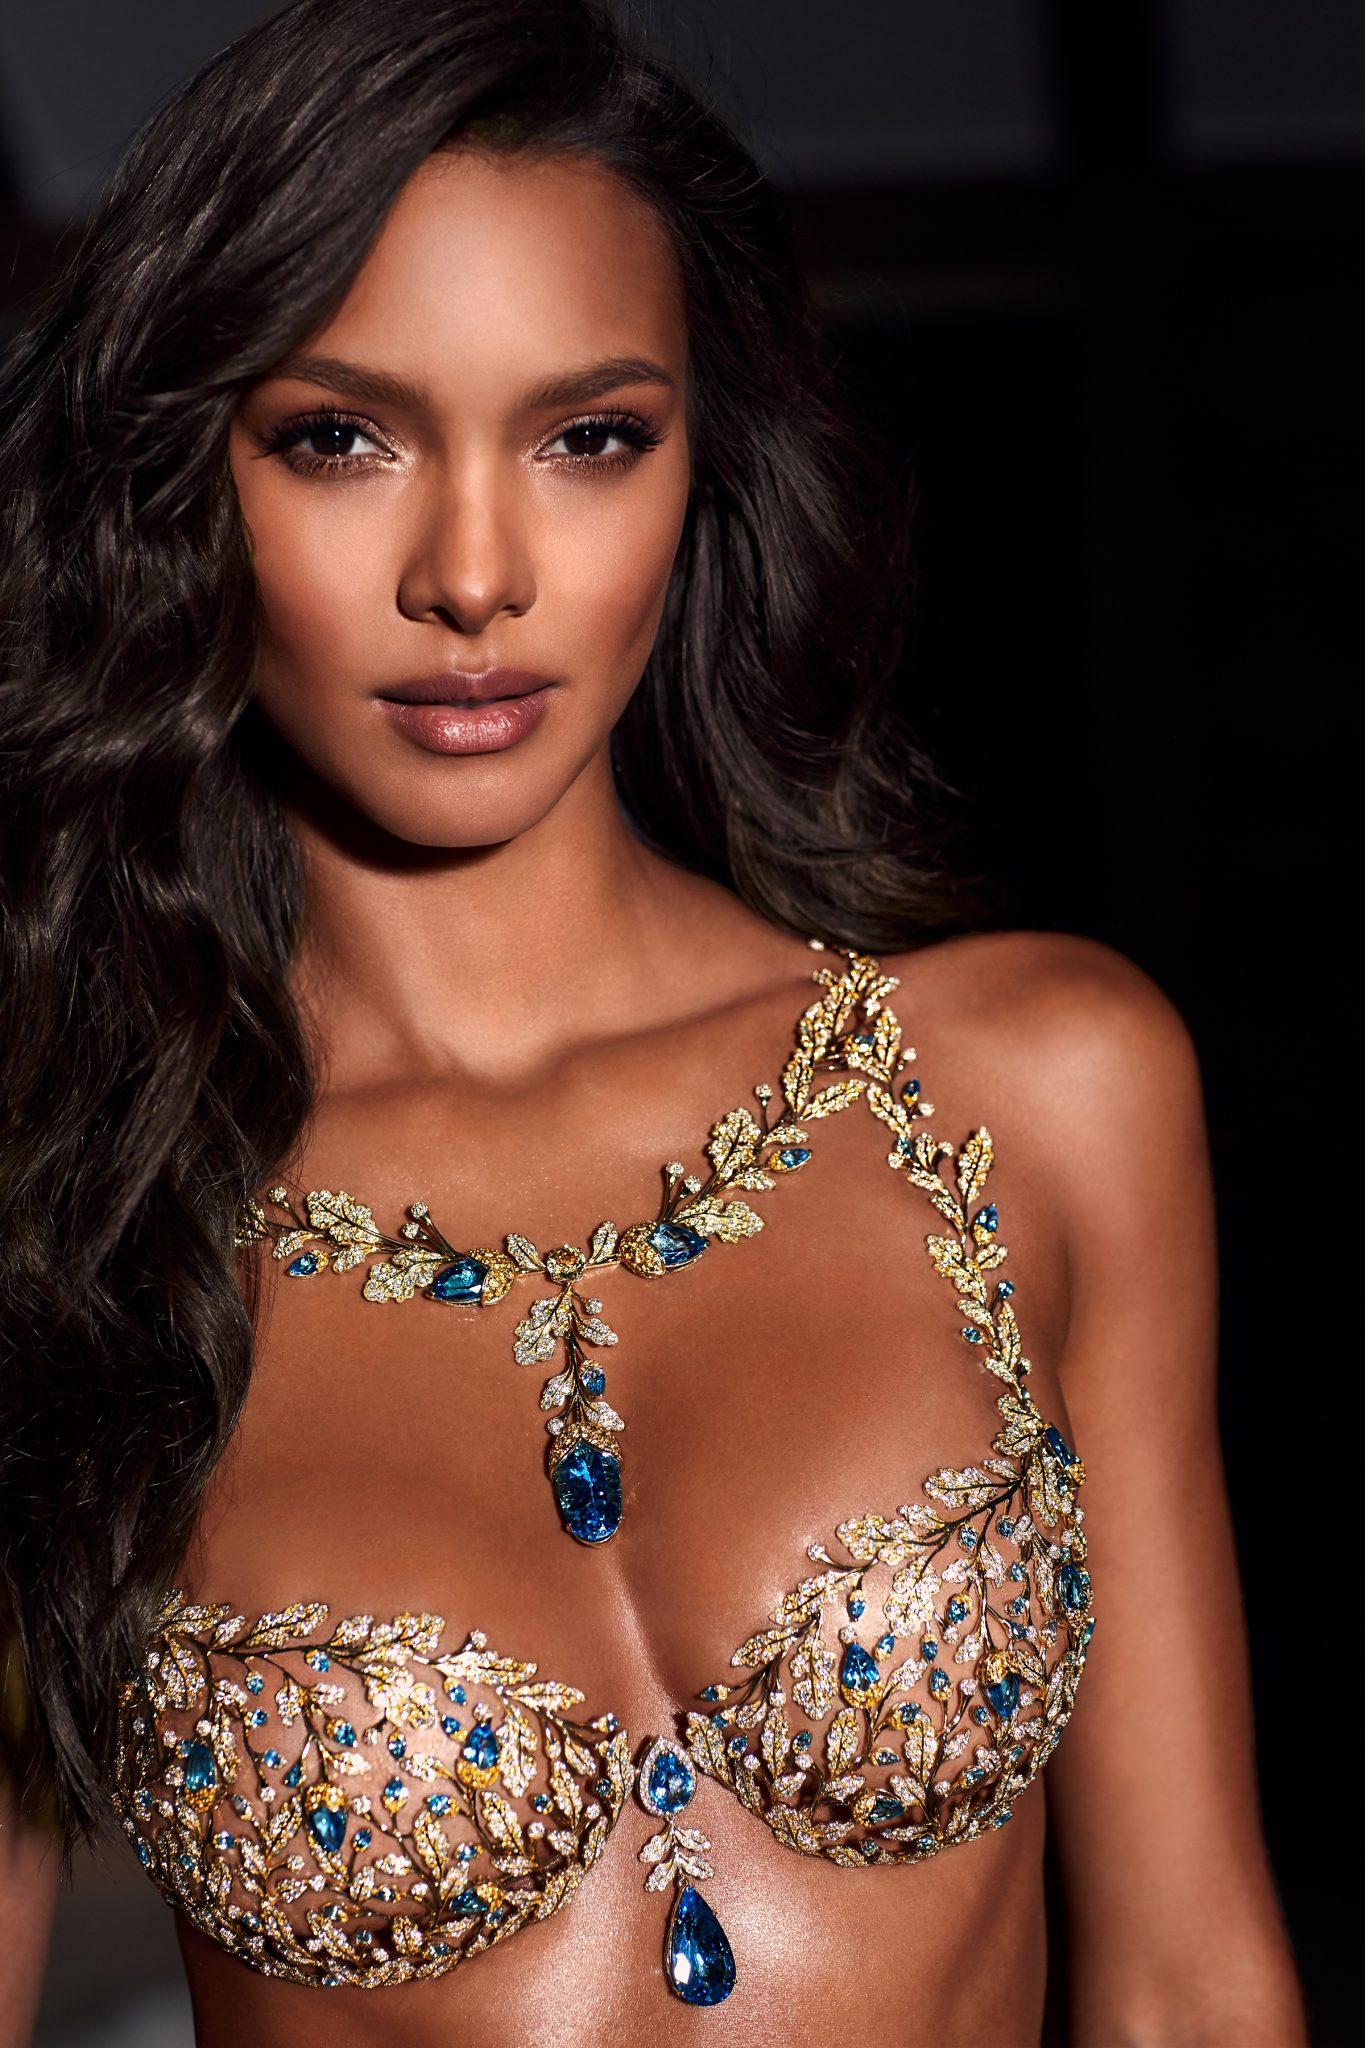 Angel Lais Ribeiro To Wear The $2 Million Champagne Nights Fantasy Bra